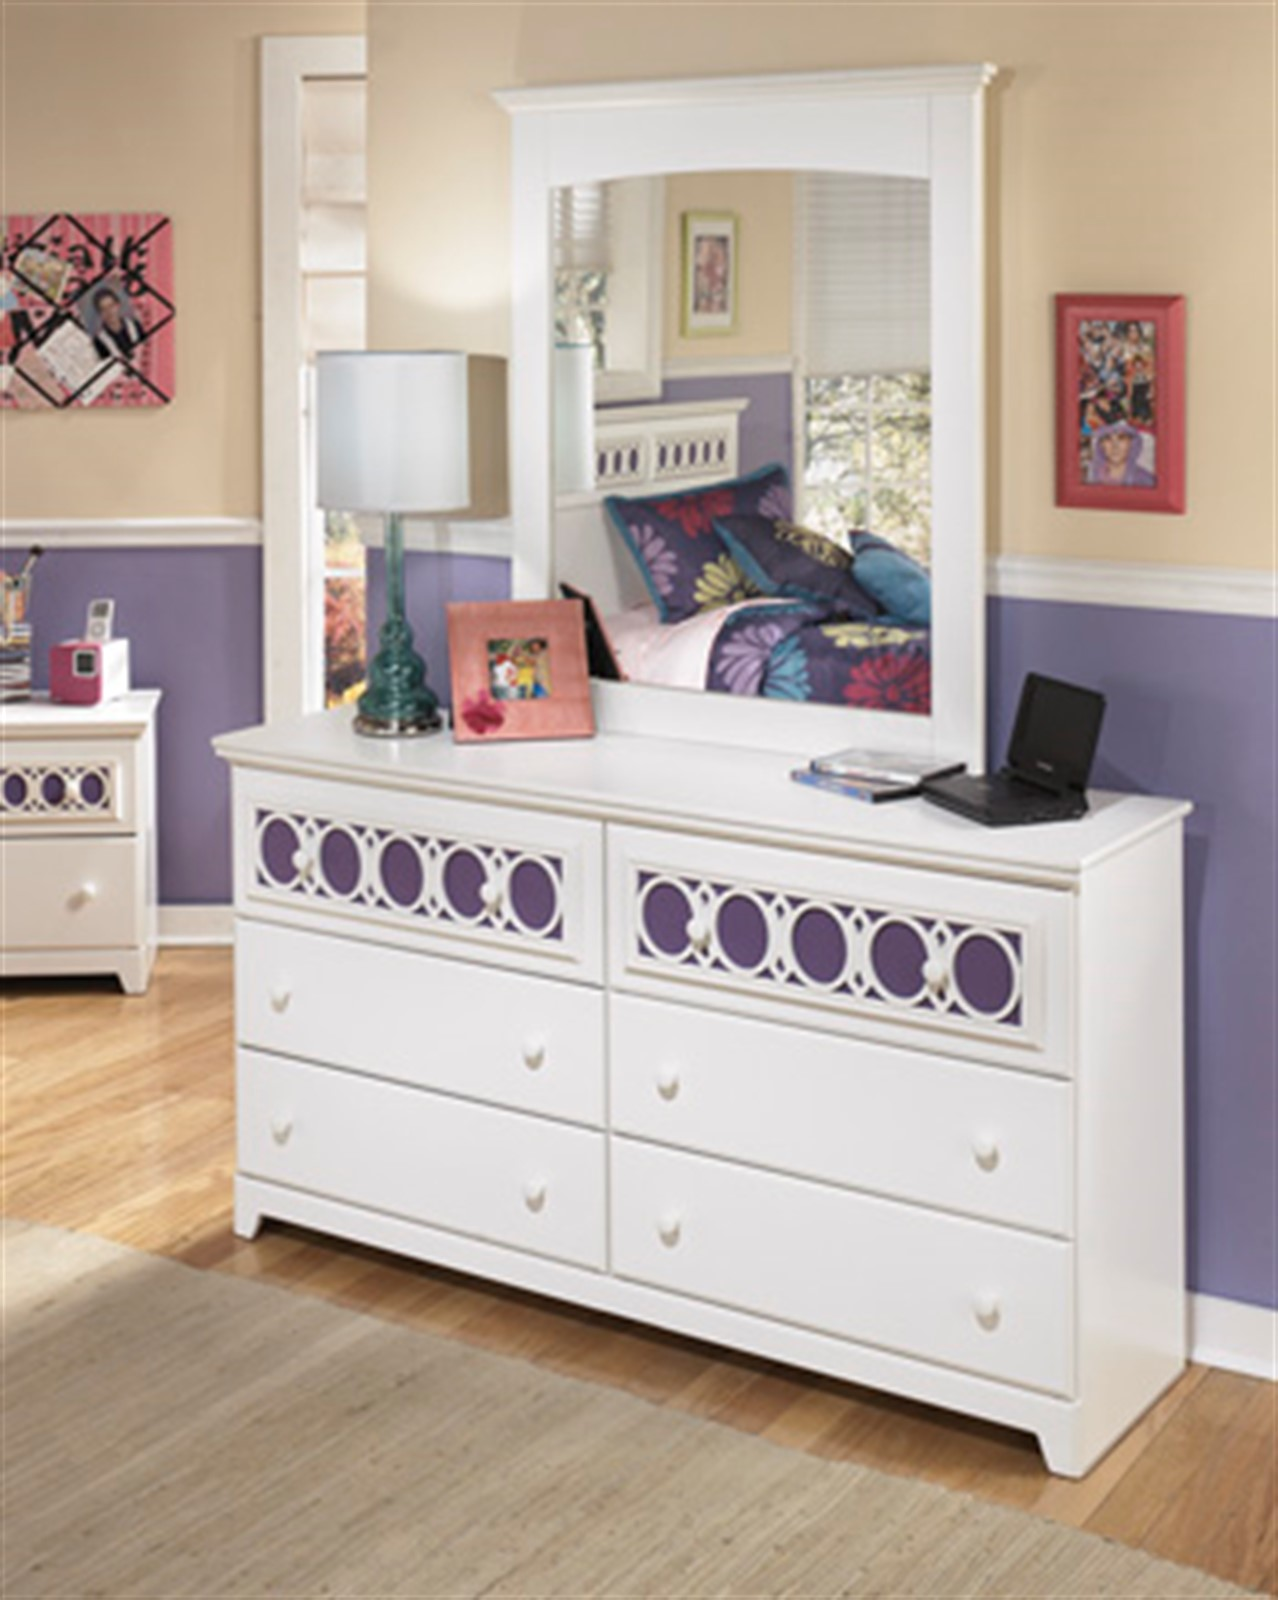 Zayley Dresser and Mirror Set - White